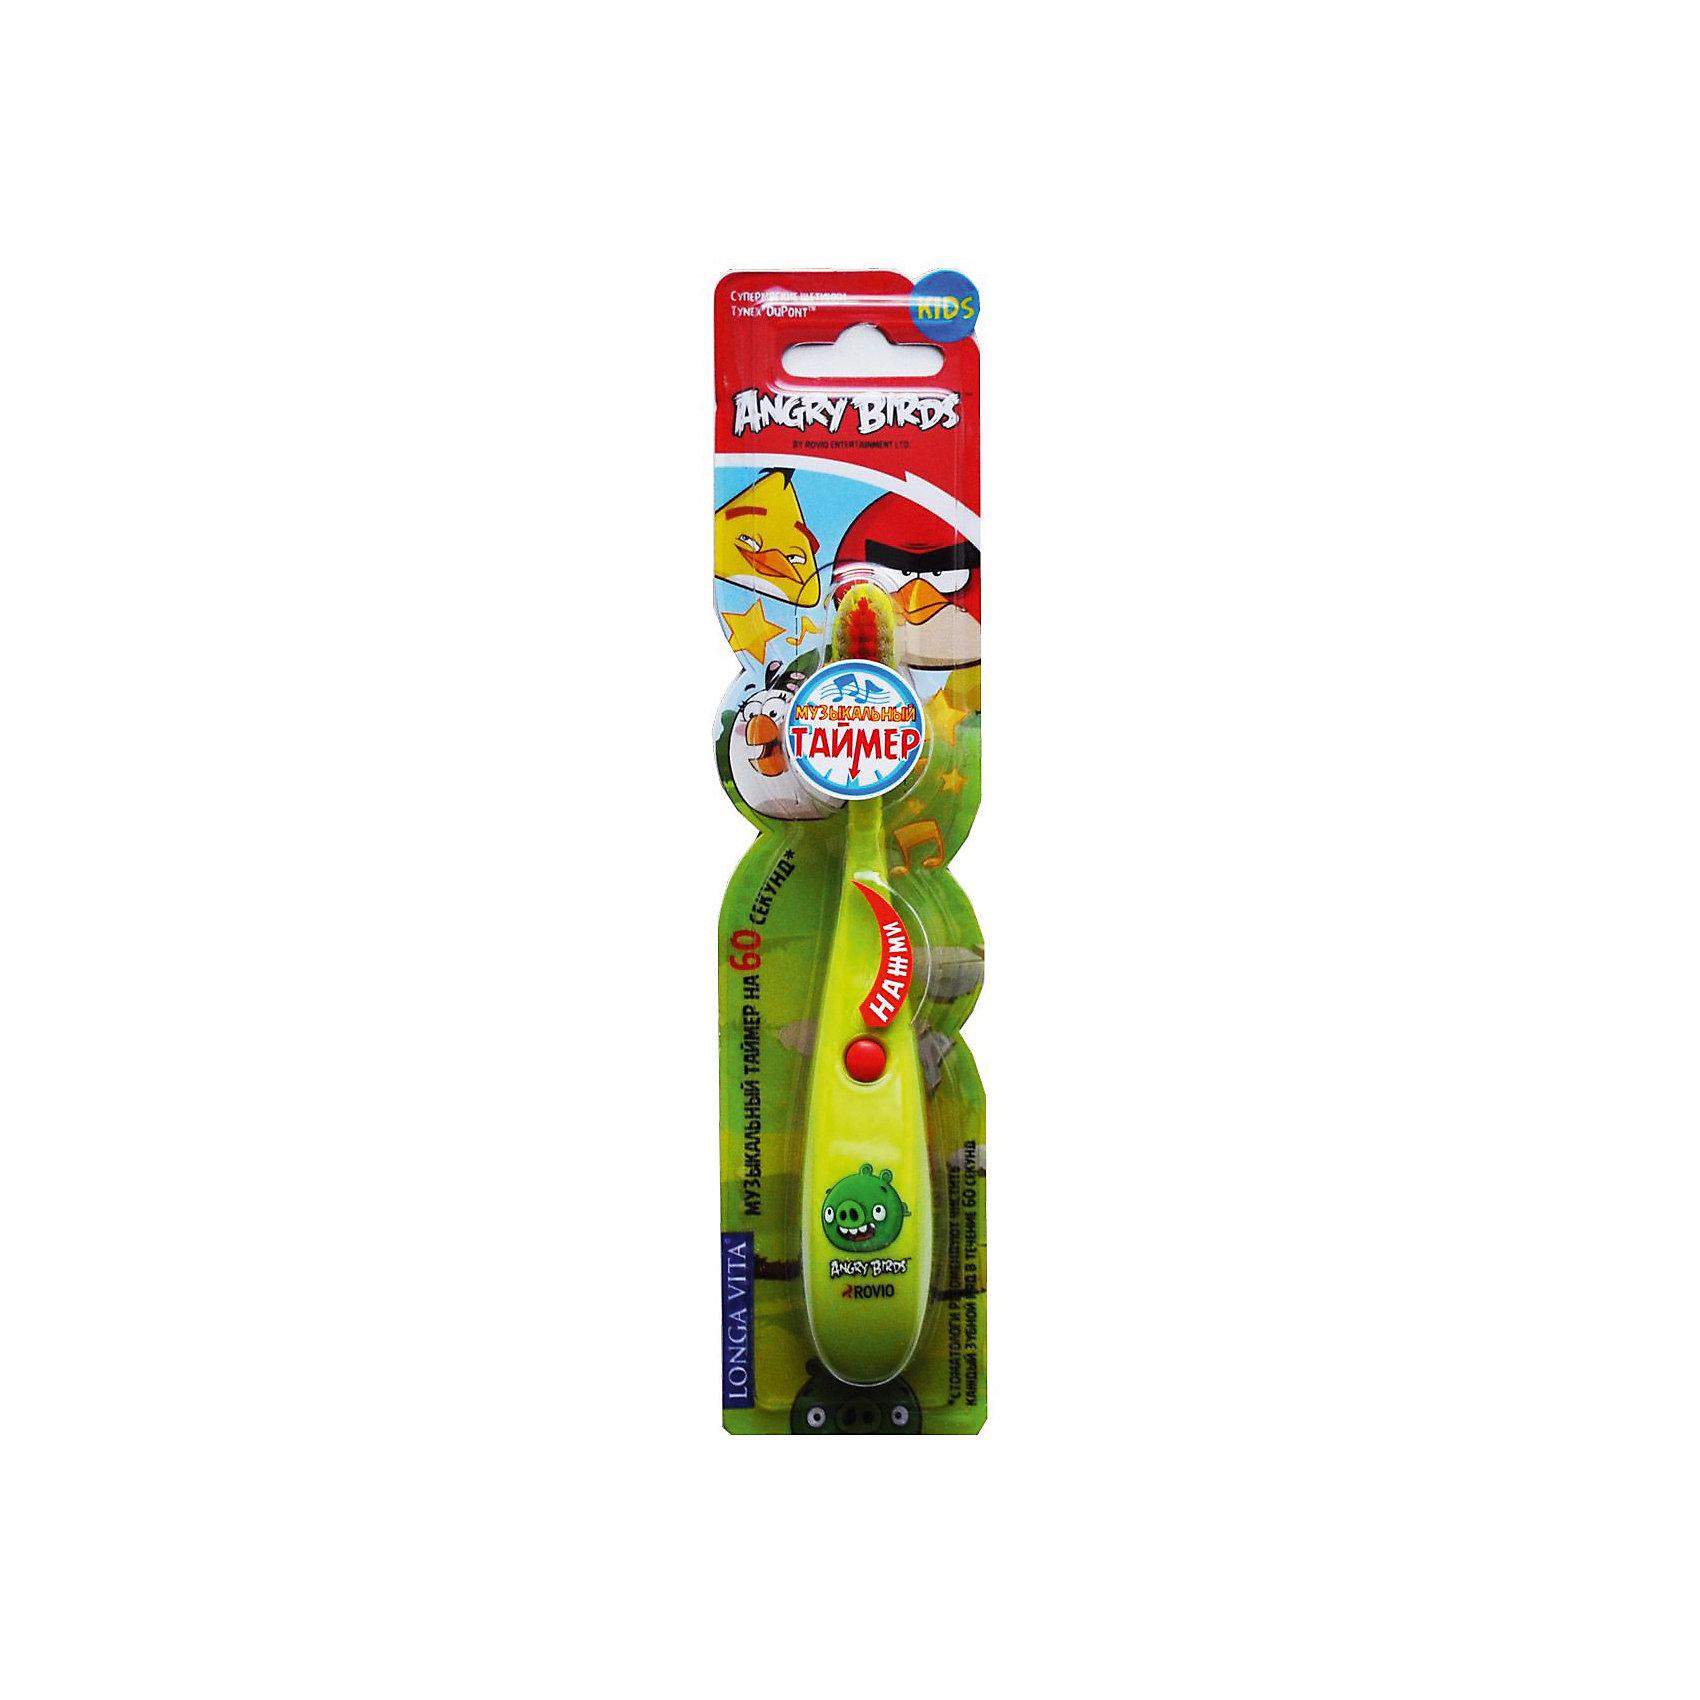 LONGA VITA Детская зубная щётка музыкальная, Angry Birds, LONGA VITA, зеленый dovo dovo 803018